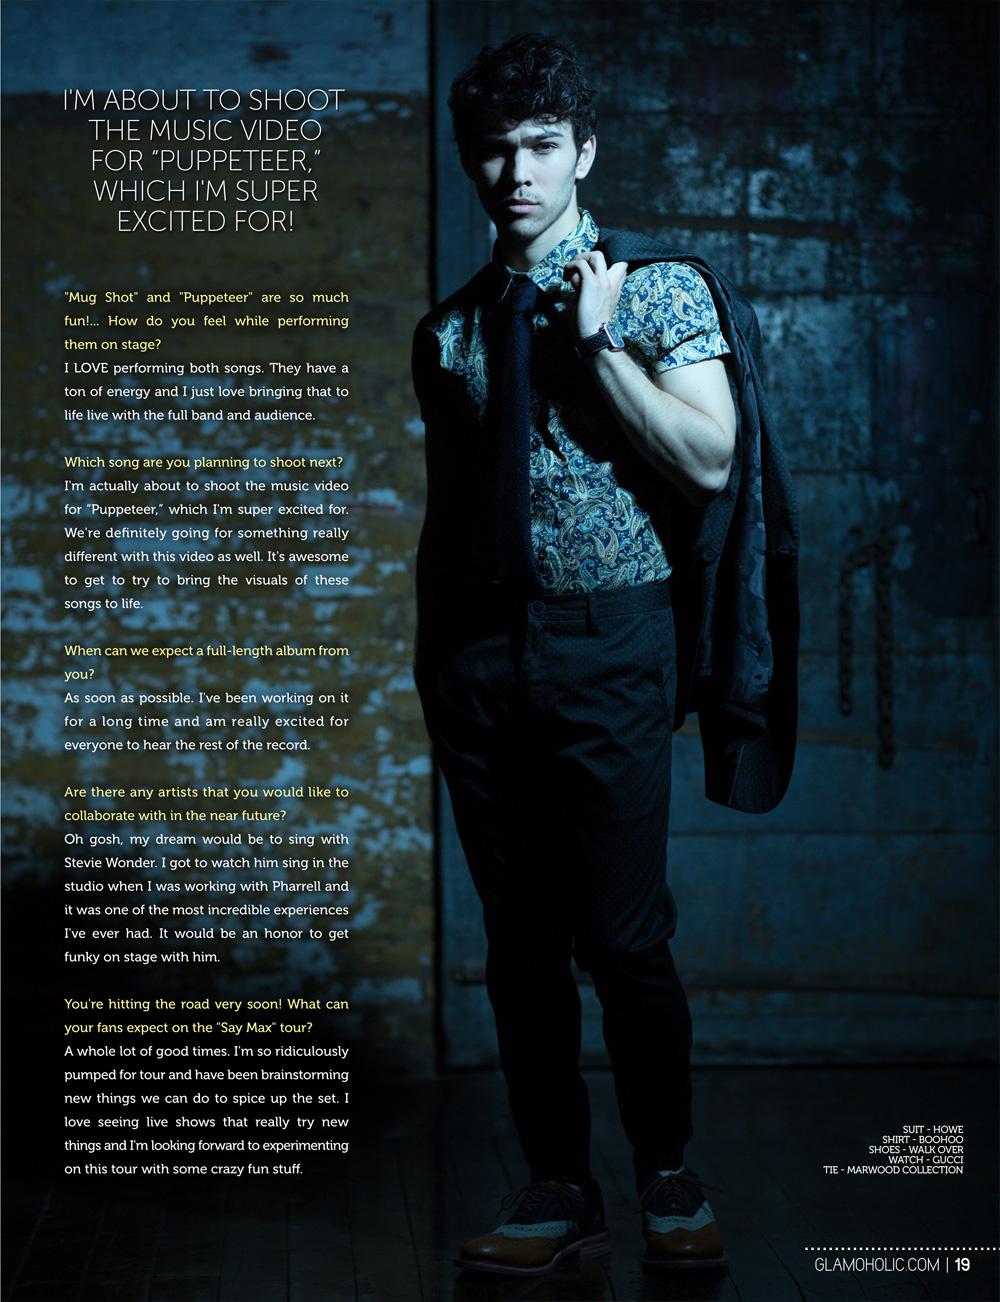 Christie Brinkley Commercial >> Max Schneider | Emily Soto | Fashion Photographer